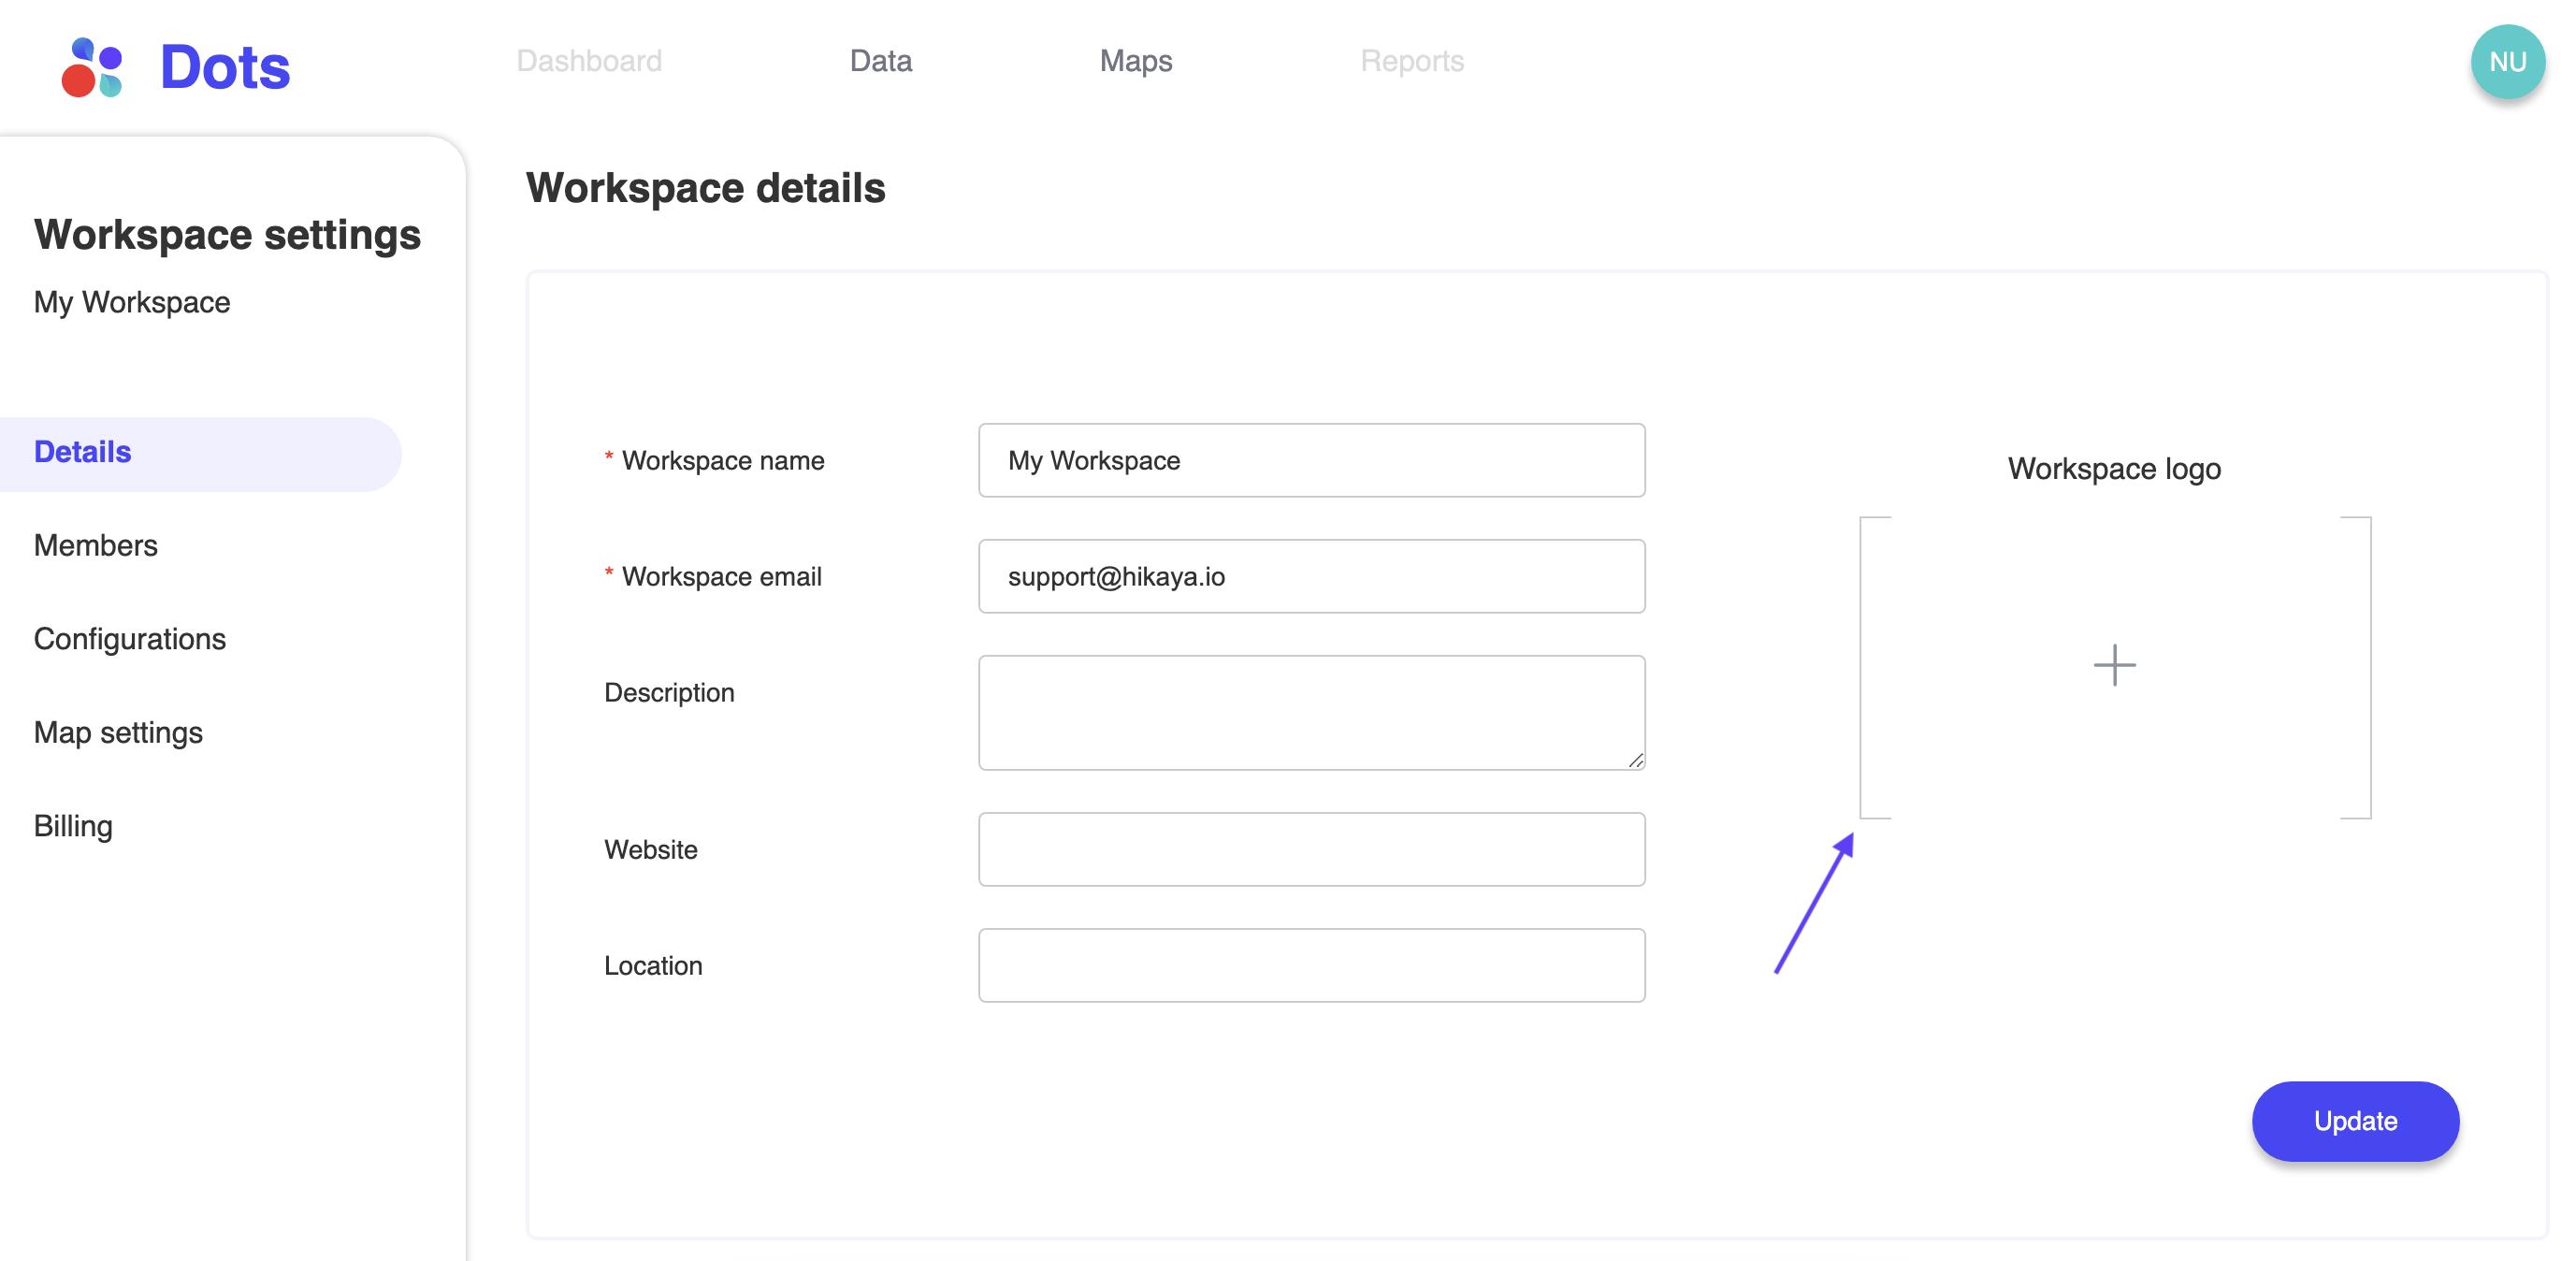 dots-upload-workspace-logo